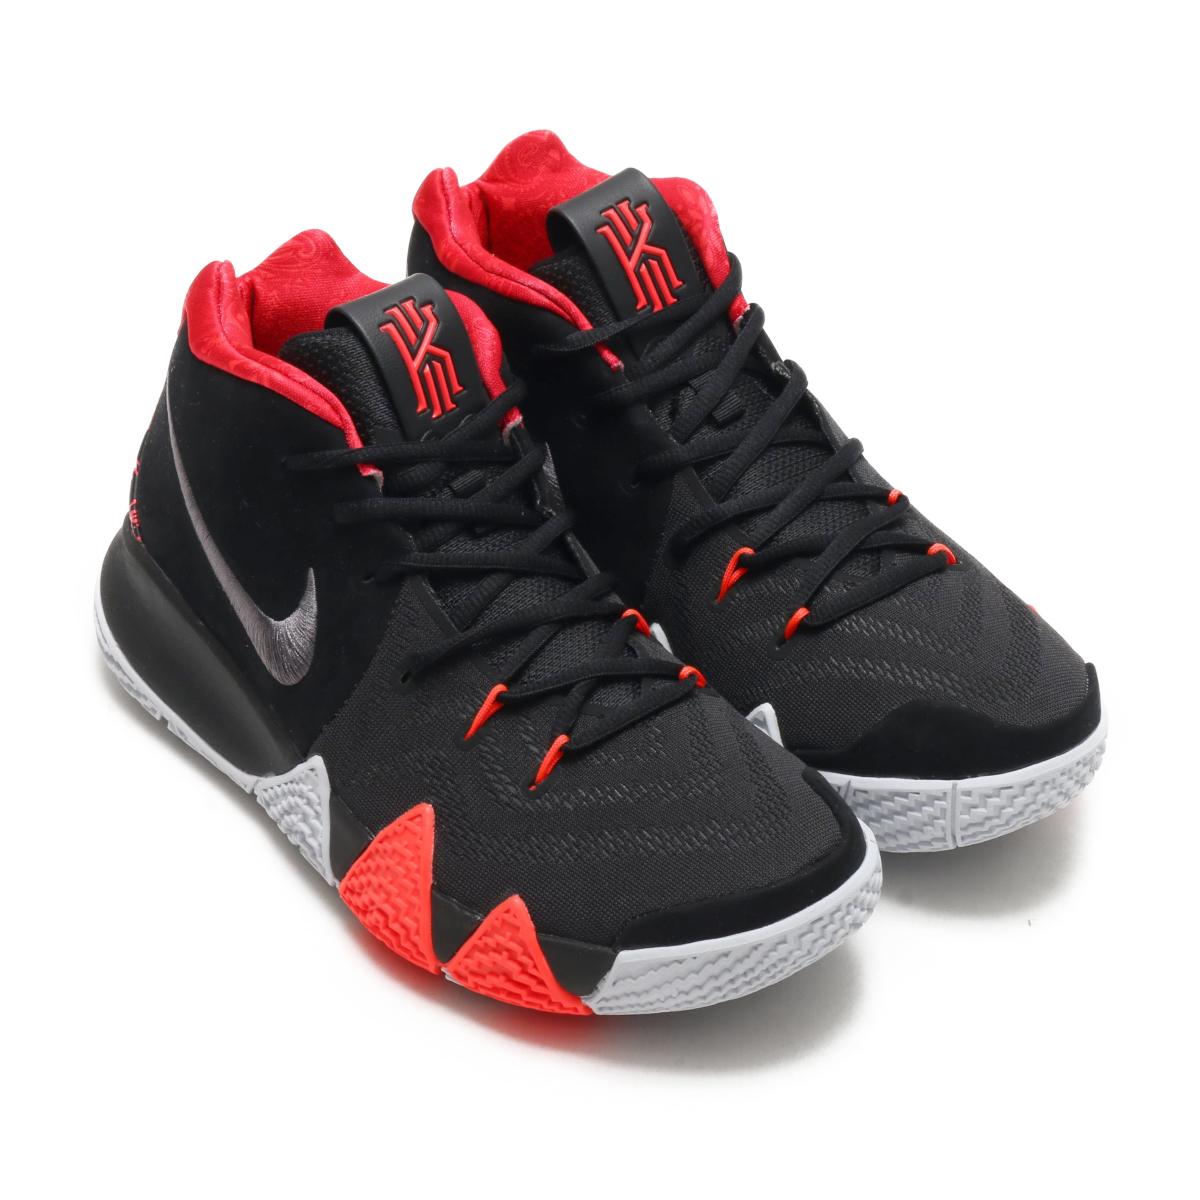 132e3946dedc atmos pink  NIKE KYRIE 4 EP (Nike chi Lee 4 EP) (BLACK DARK GREY ...